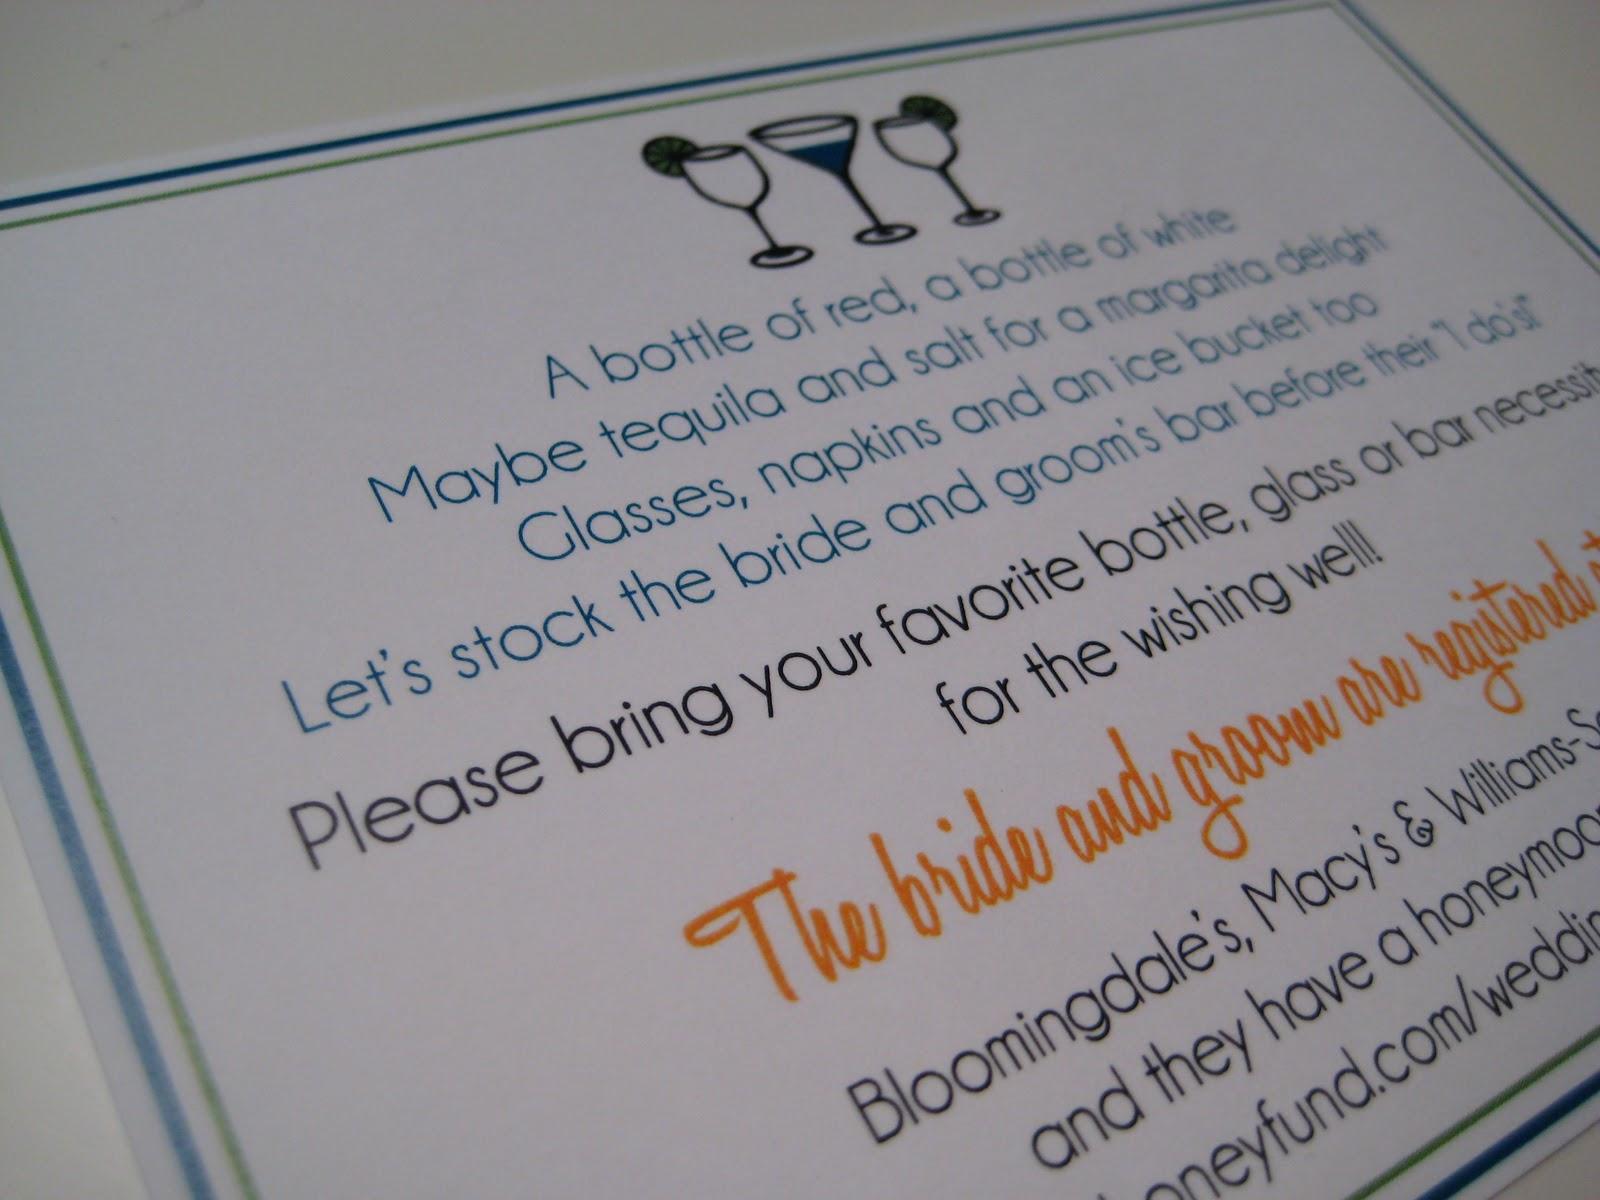 Maid Of Honor Invitation Wording with amazing invitation ideas